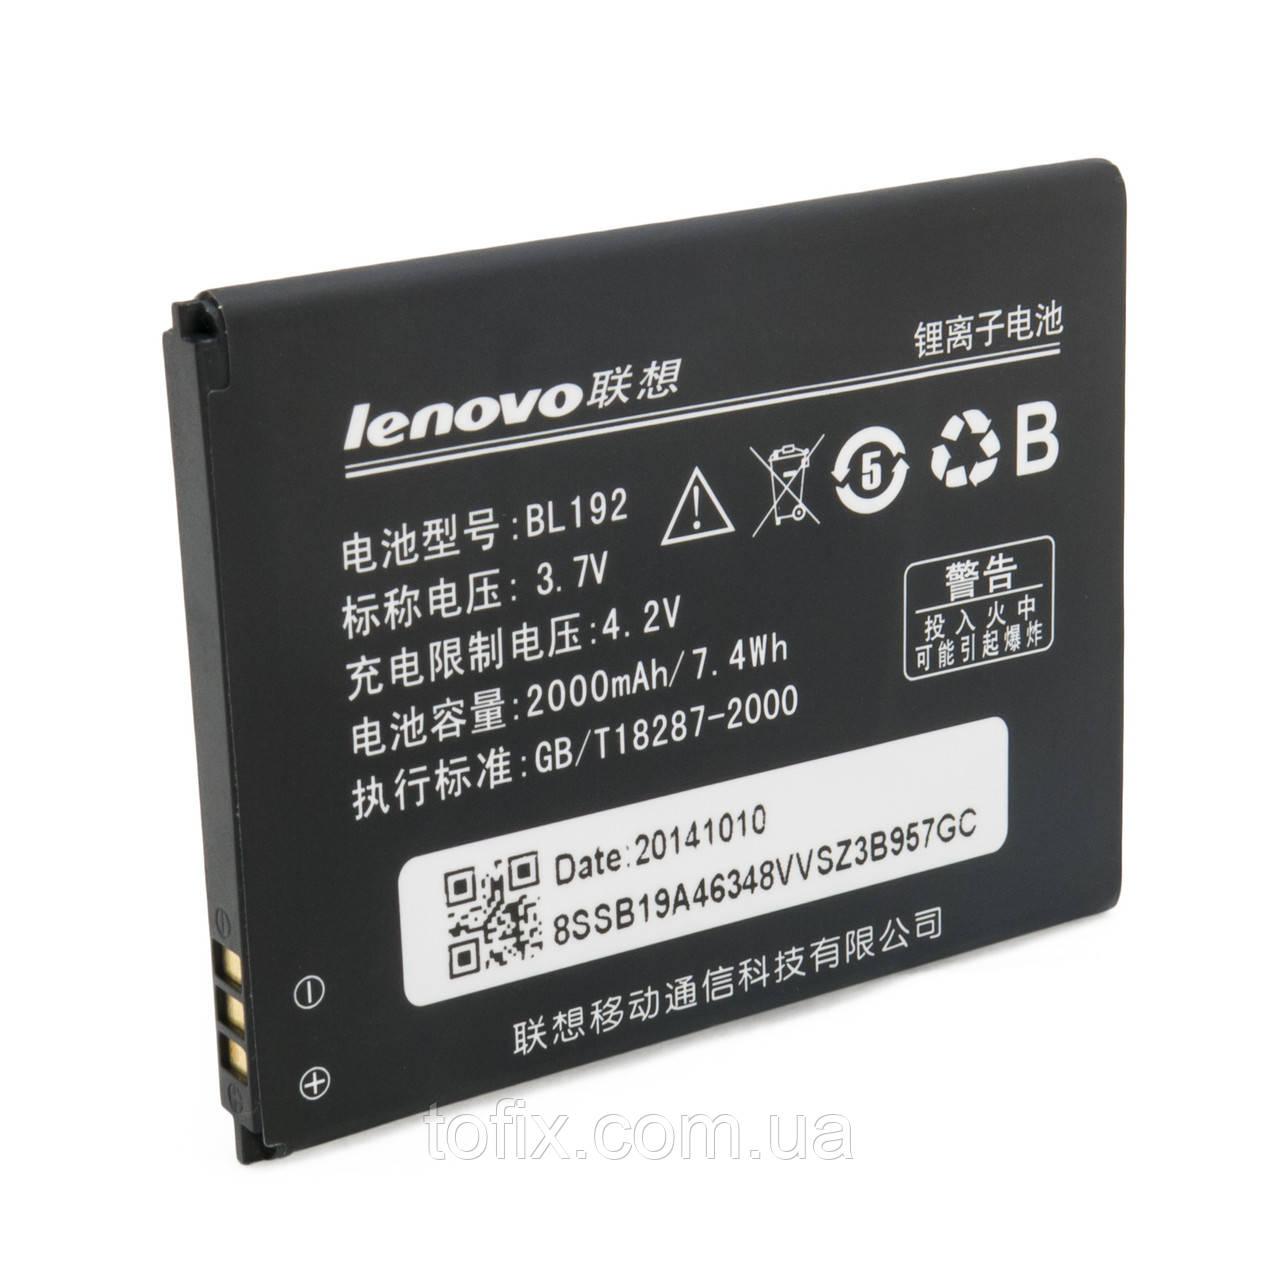 Батарея (акб, акумулятор) BL192 для Lenovo A750 IdeaPhone, 2000 mAh, оригінал